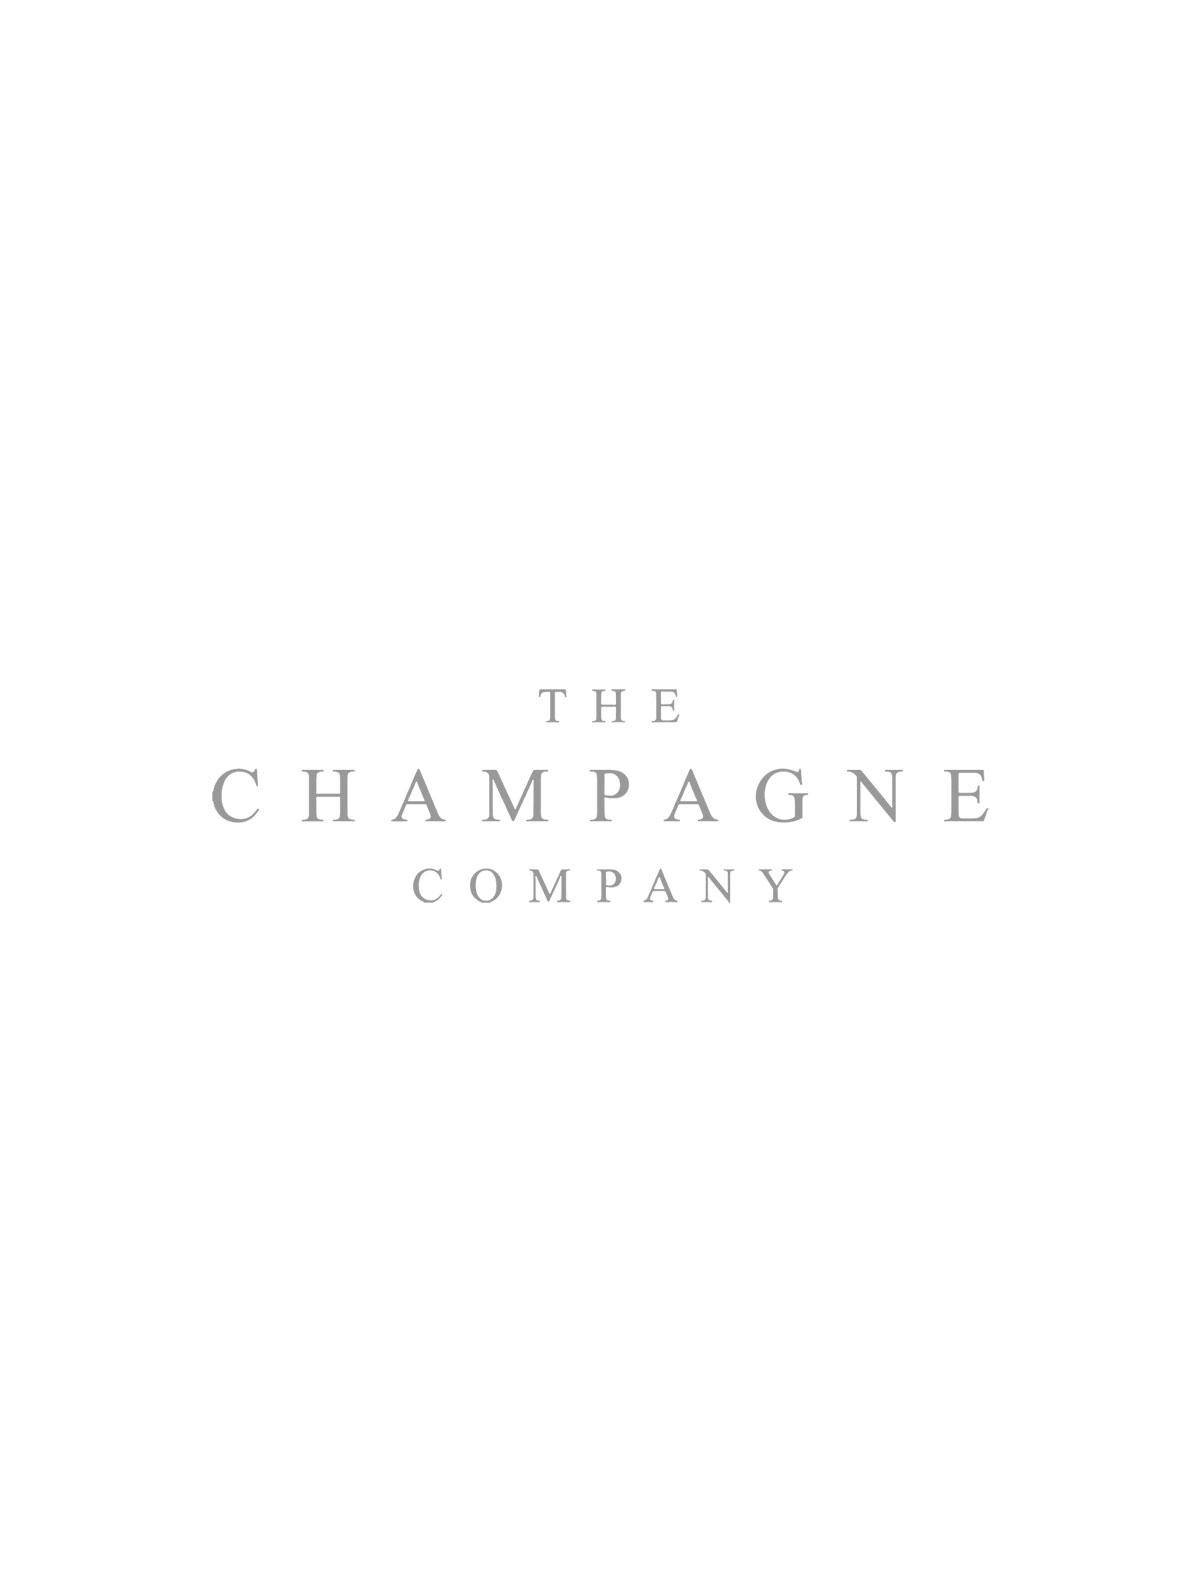 Domaine Chanson Bourgogne Chardonnay 2015 White Wine 75cl